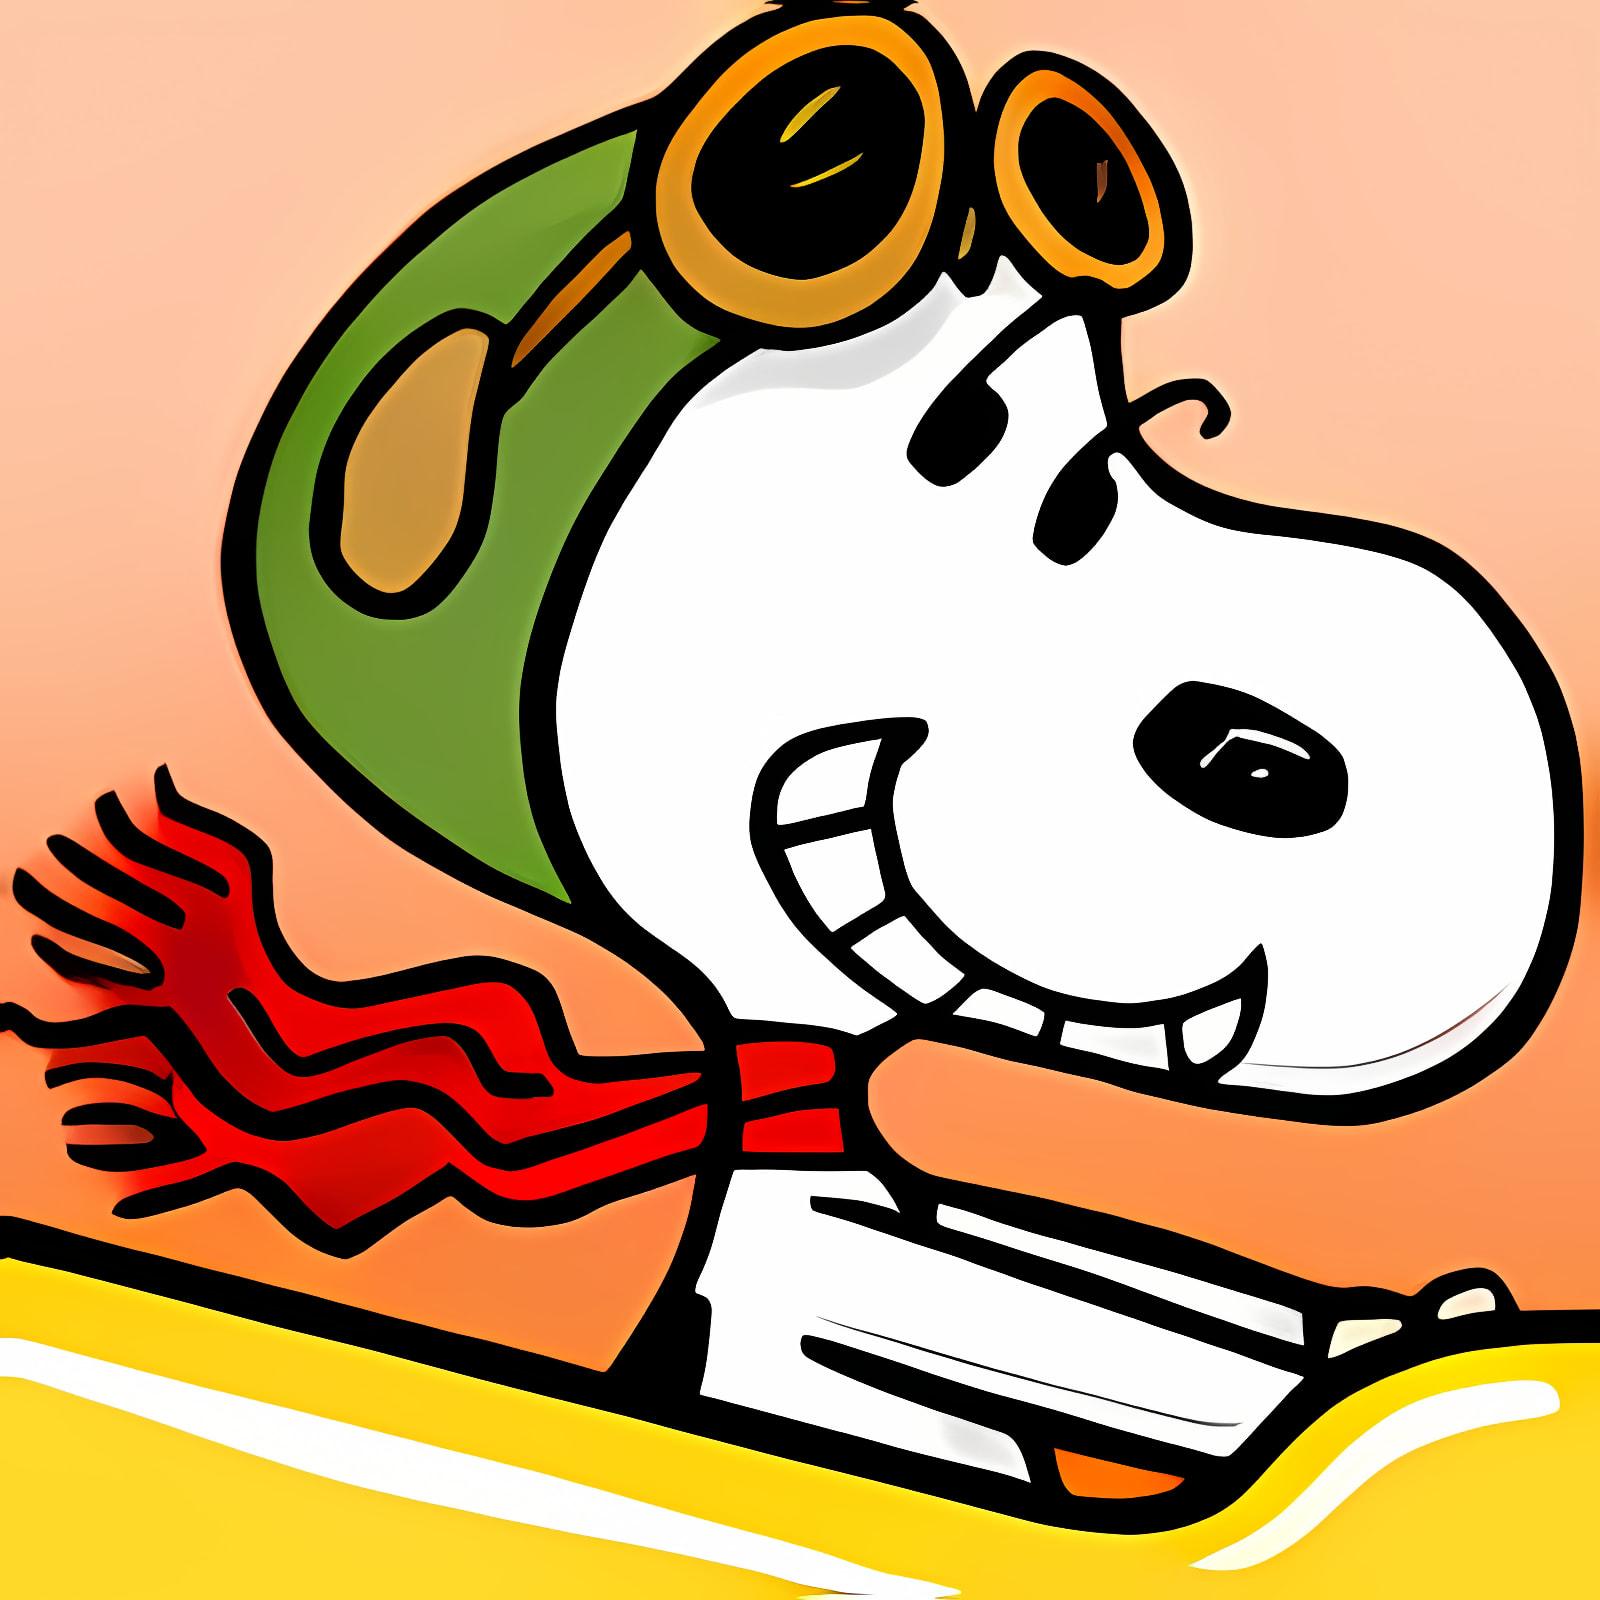 Snoopy Coaster 1.1.1